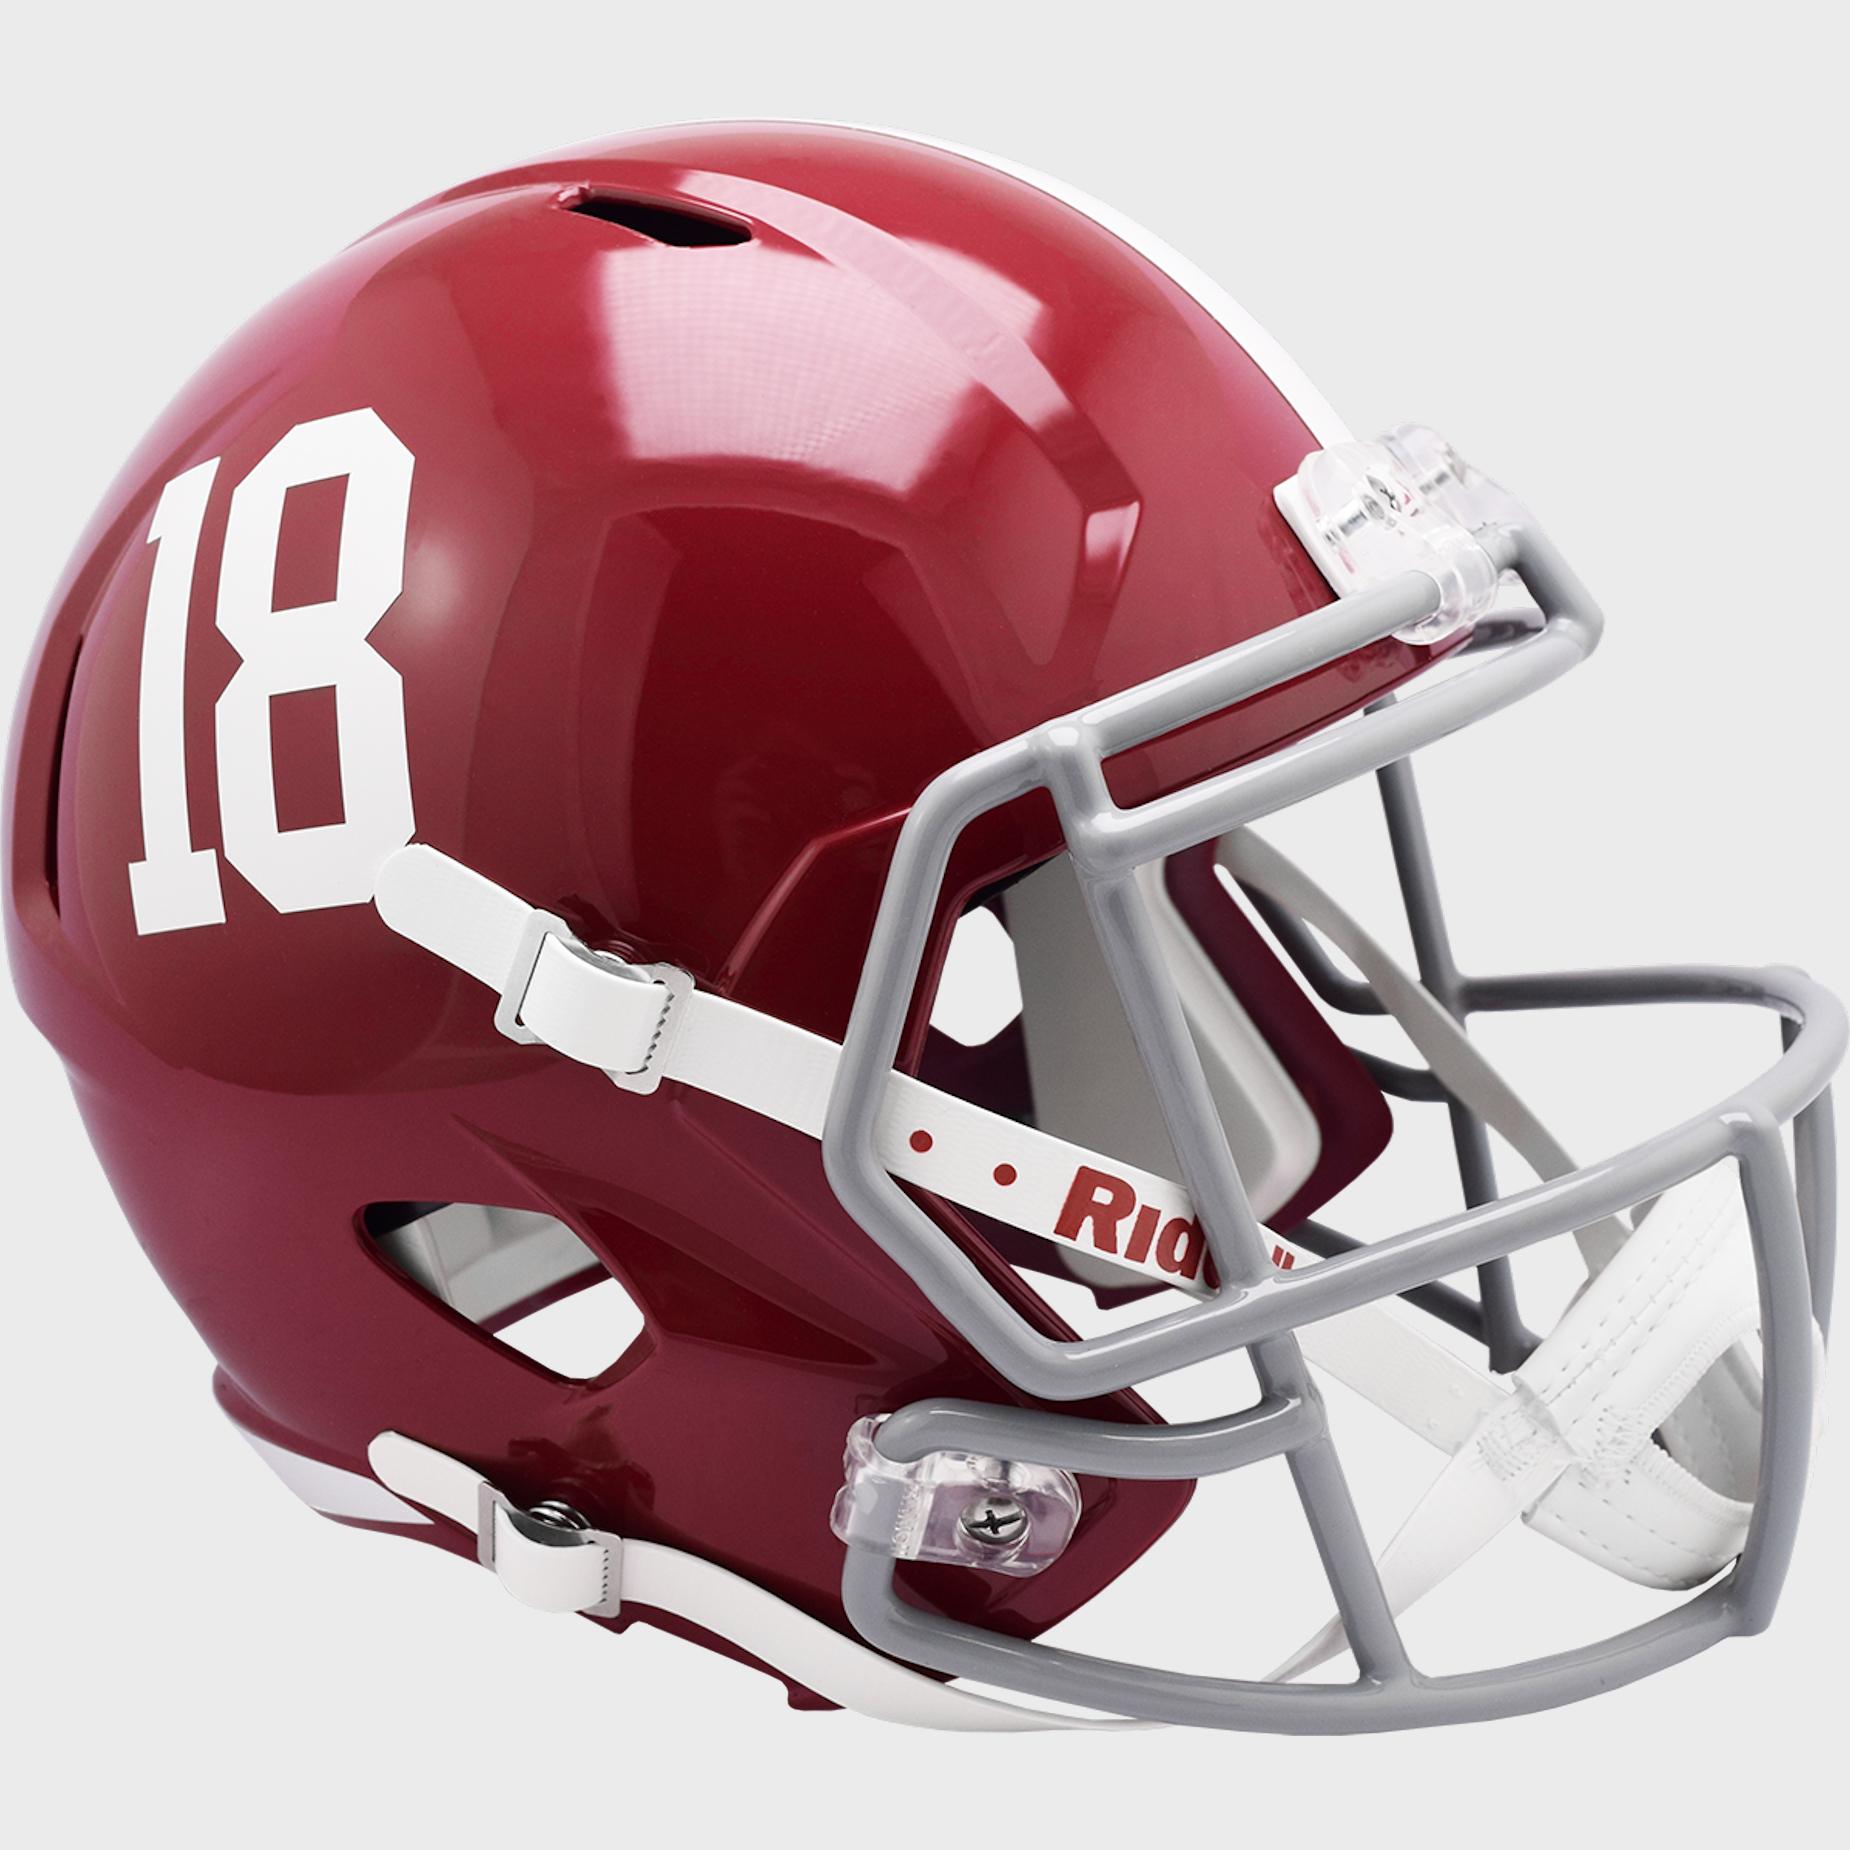 Alabama Crimson Tide Speed Replica Football Helmet #18 <B>NEW 2021</B>